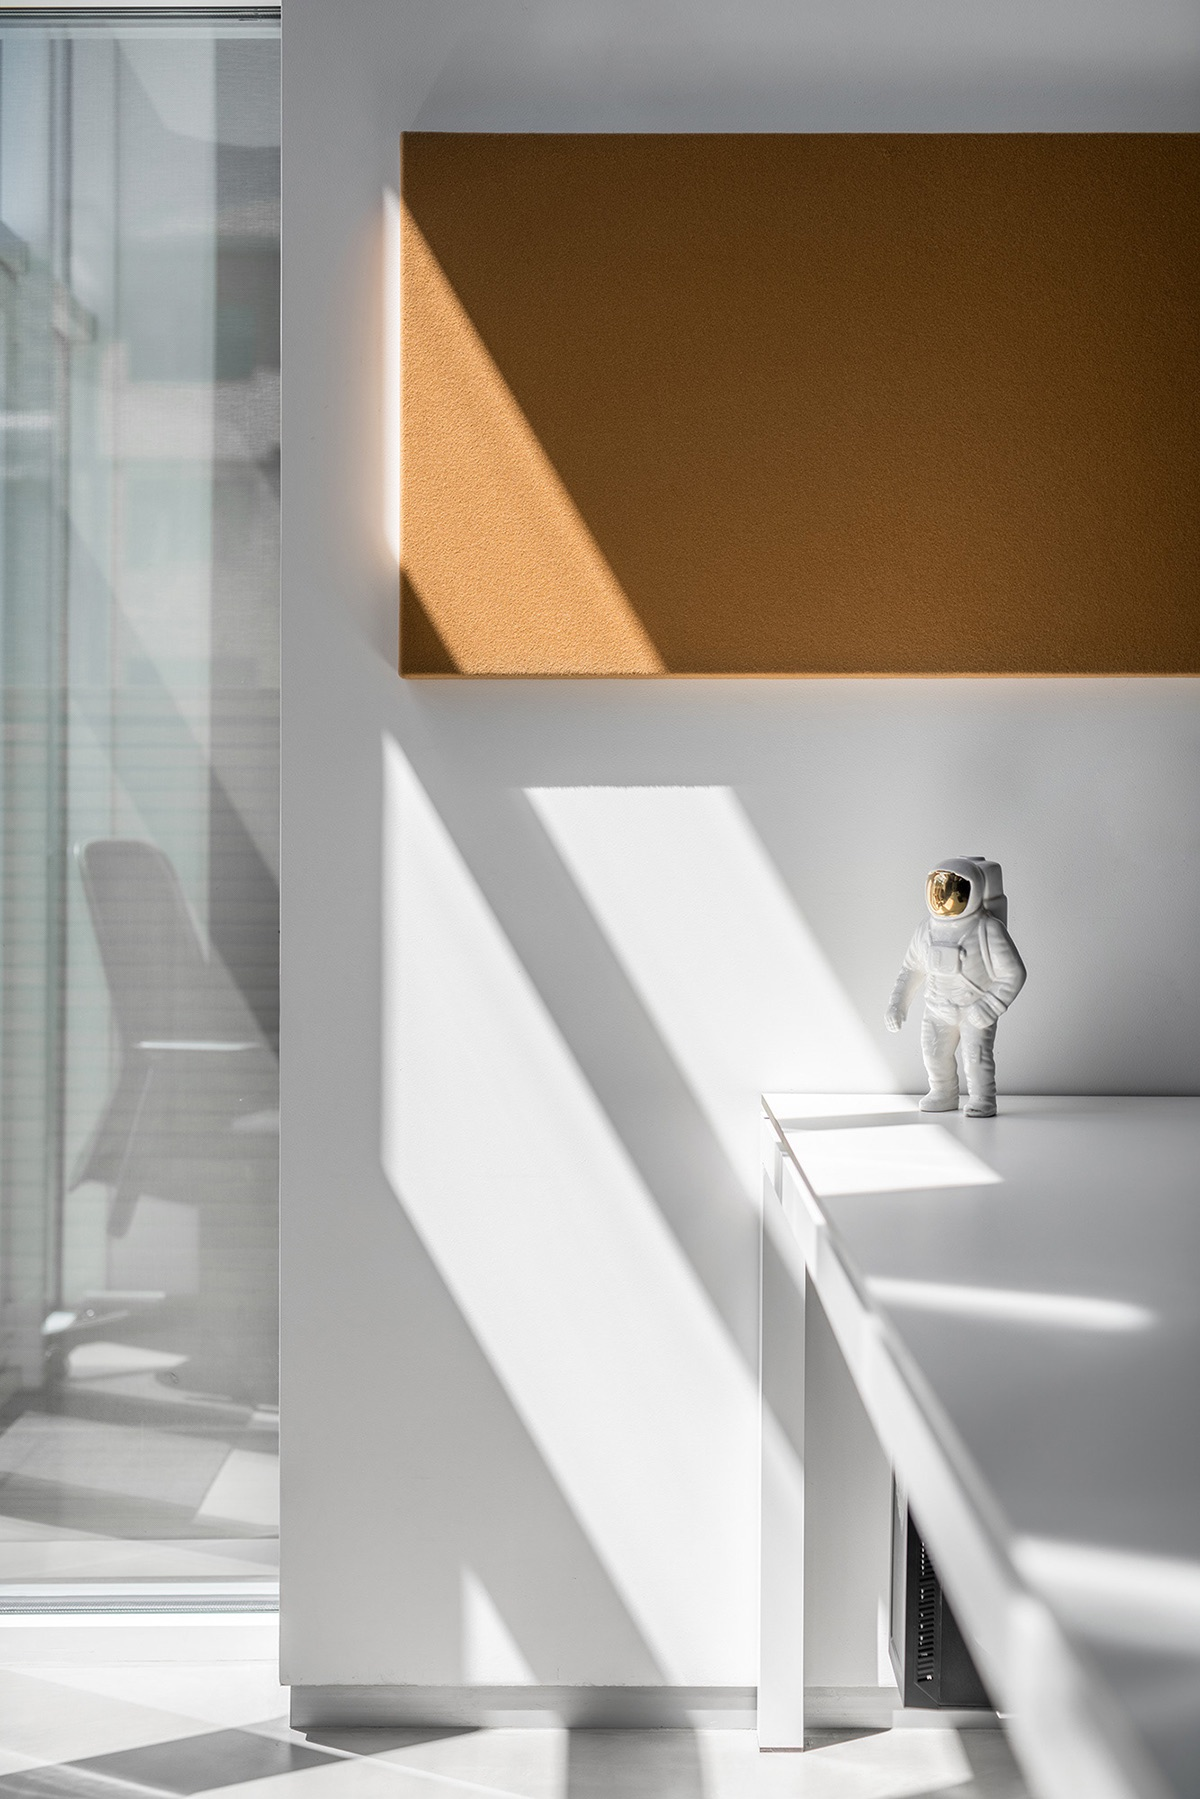 yod-design-lab-office-8